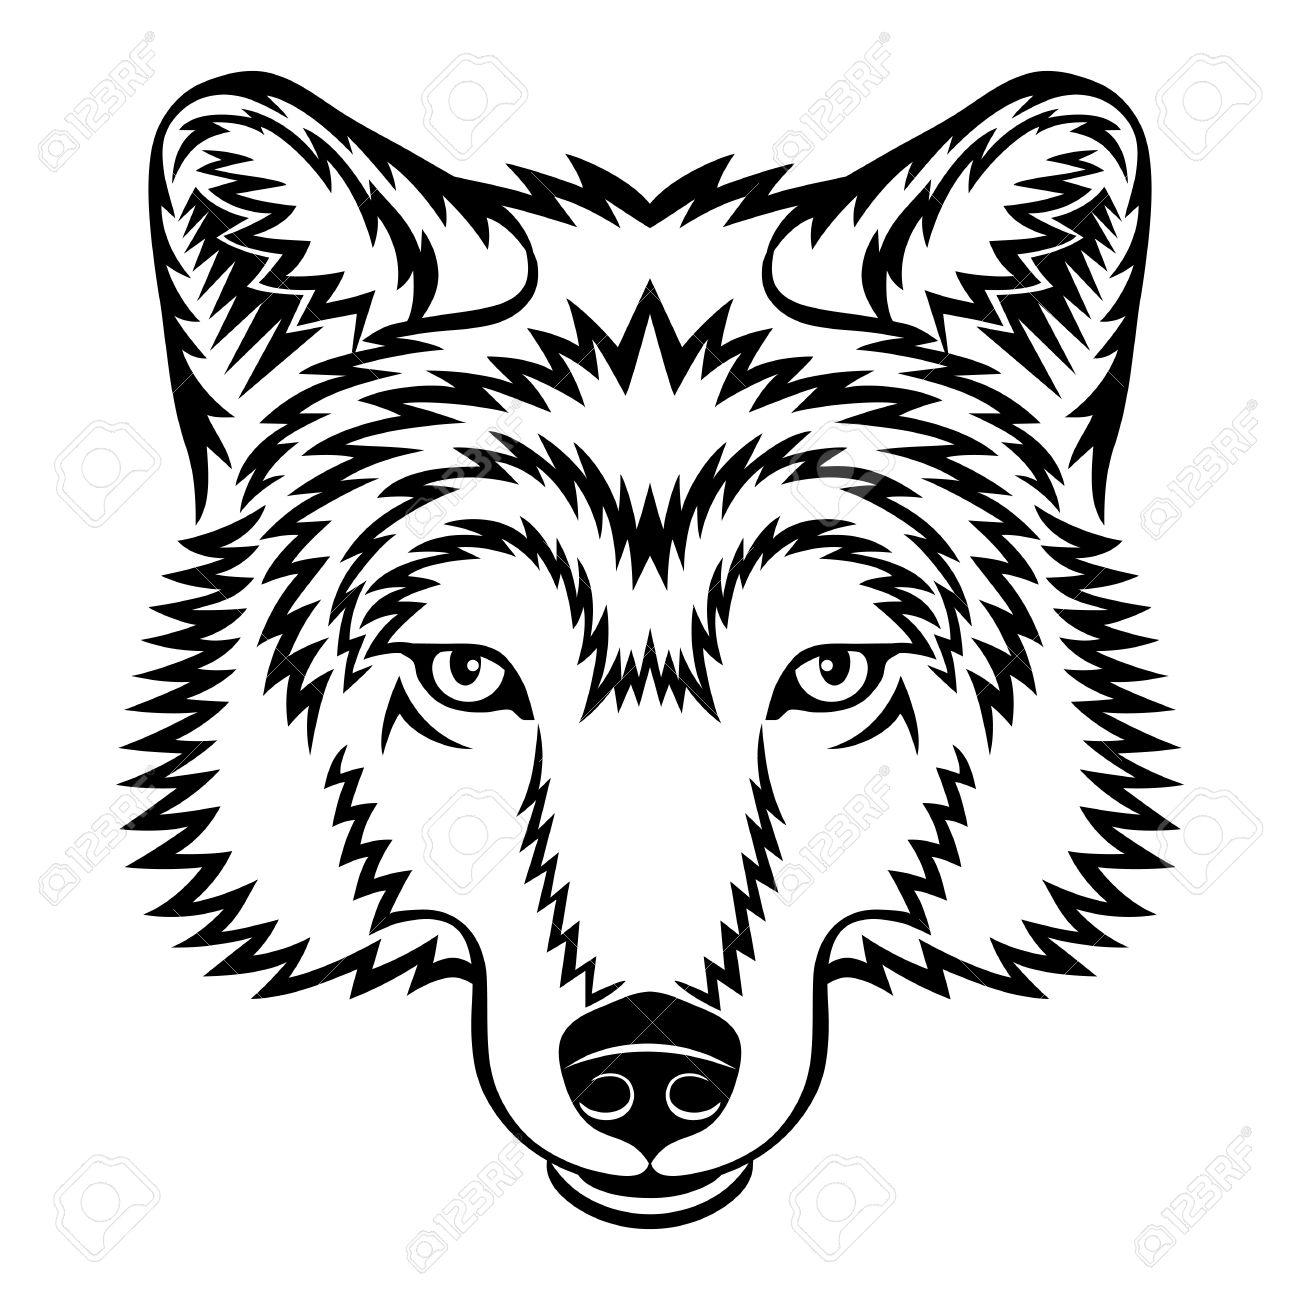 Wolf Head Line Drawing At Getdrawings